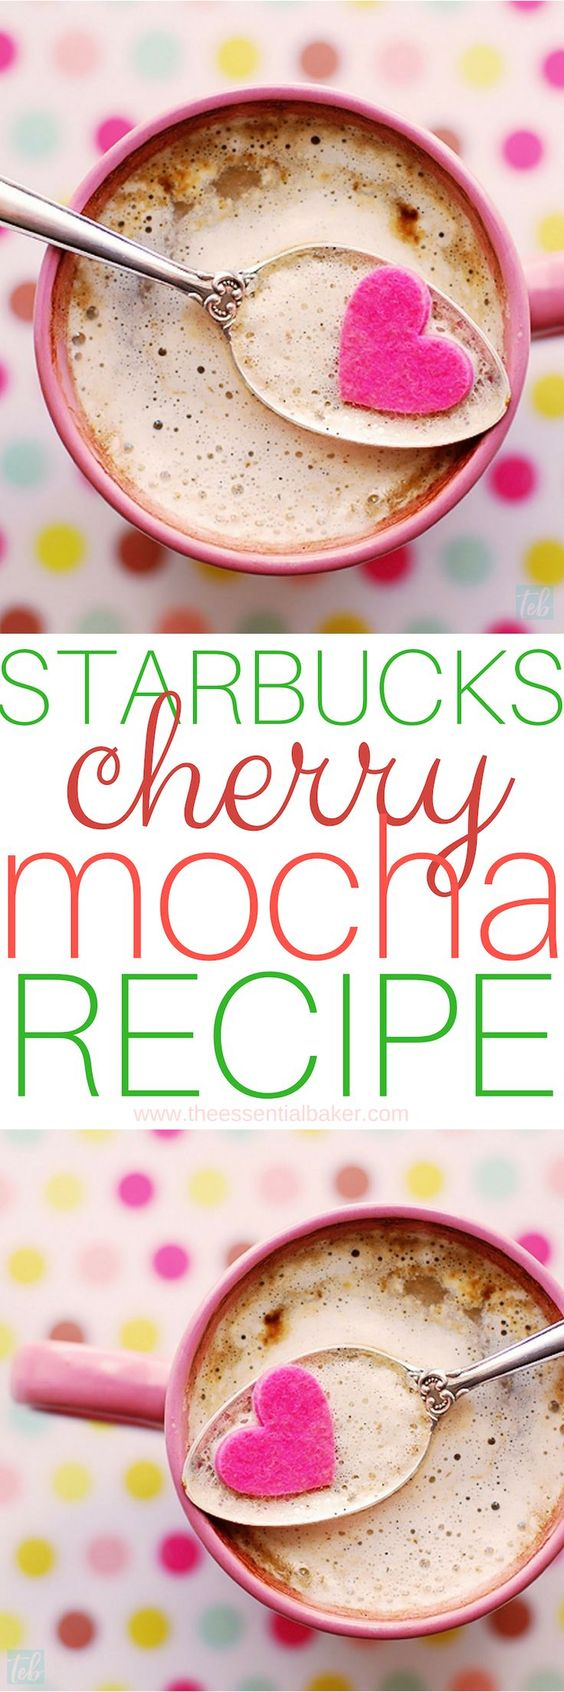 Copycat Starbucks Cherry Mocha